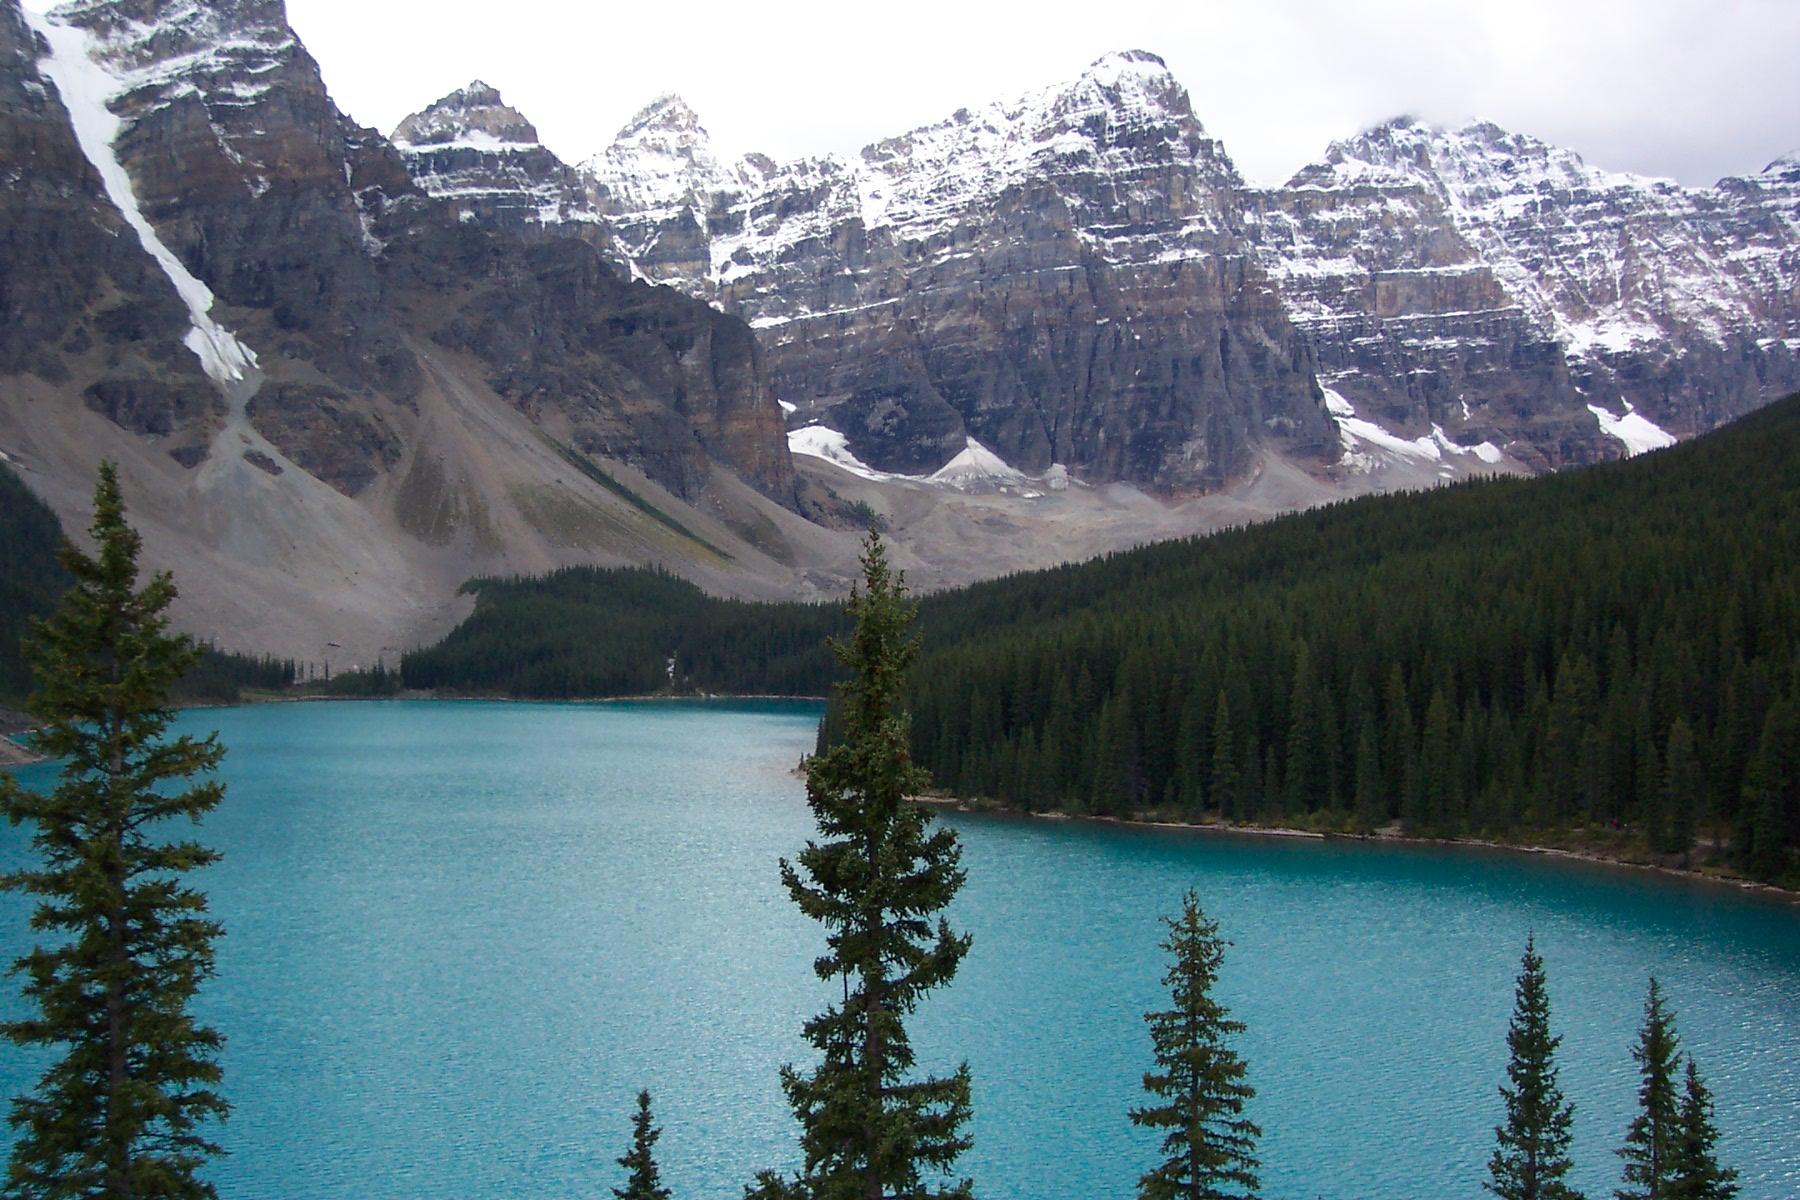 Moraine_lake_in_Banff_national_park.jpg